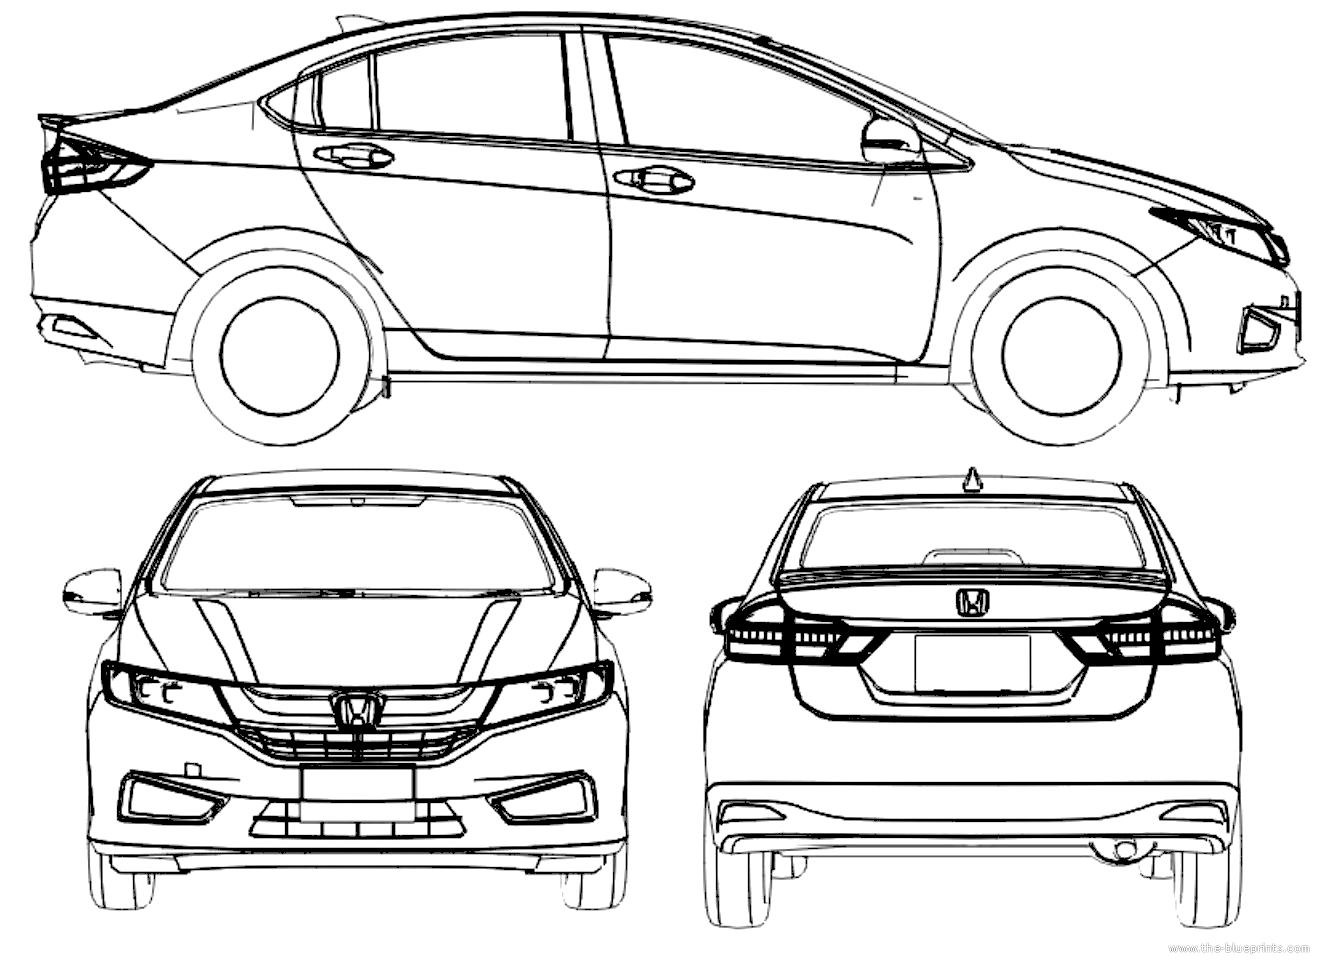 Blueprints Gt Cars Gt Honda Gt Honda Grace